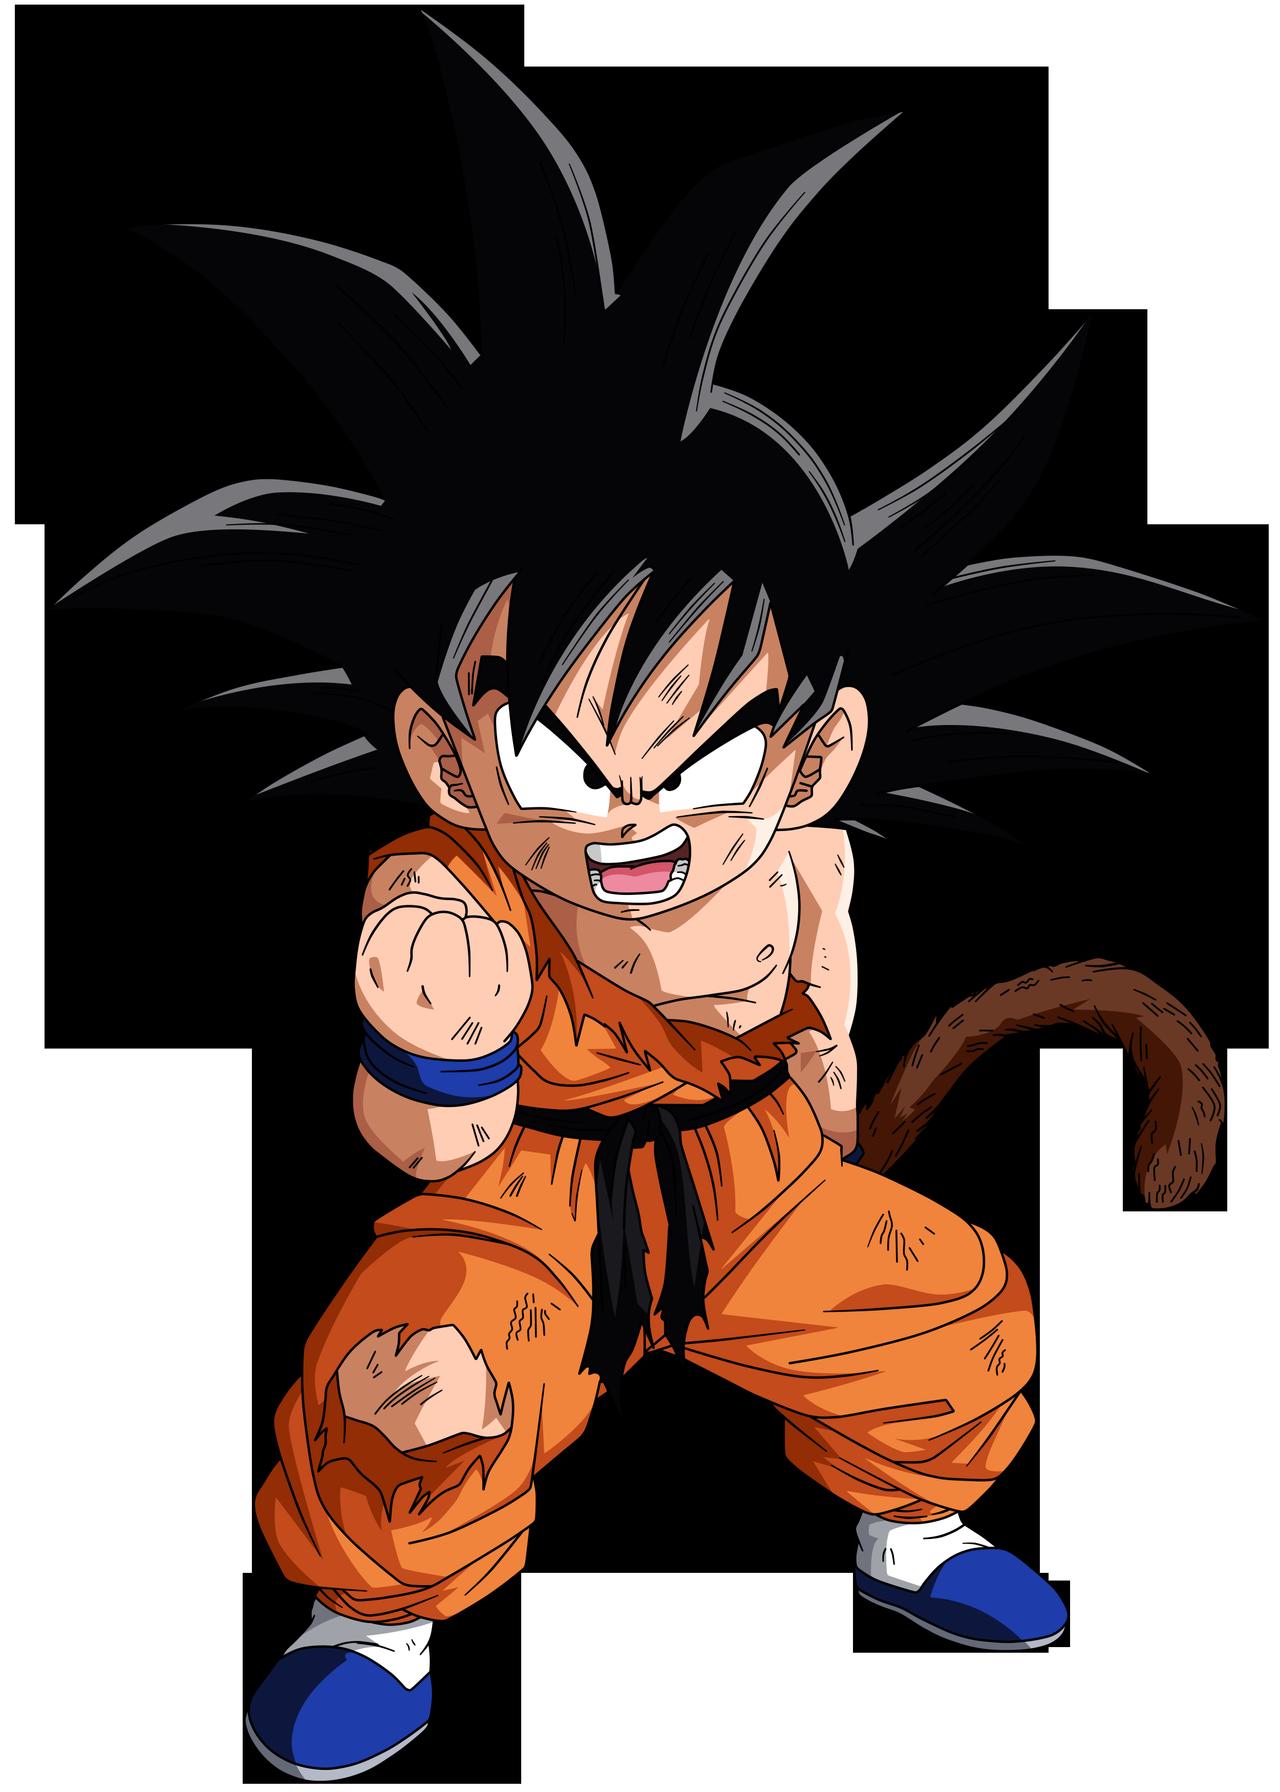 Dragon Ball Kid Goku 42 By Superjmanplay2 Anime Dragon Ball Super Dragon Ball Super Manga Kid Goku